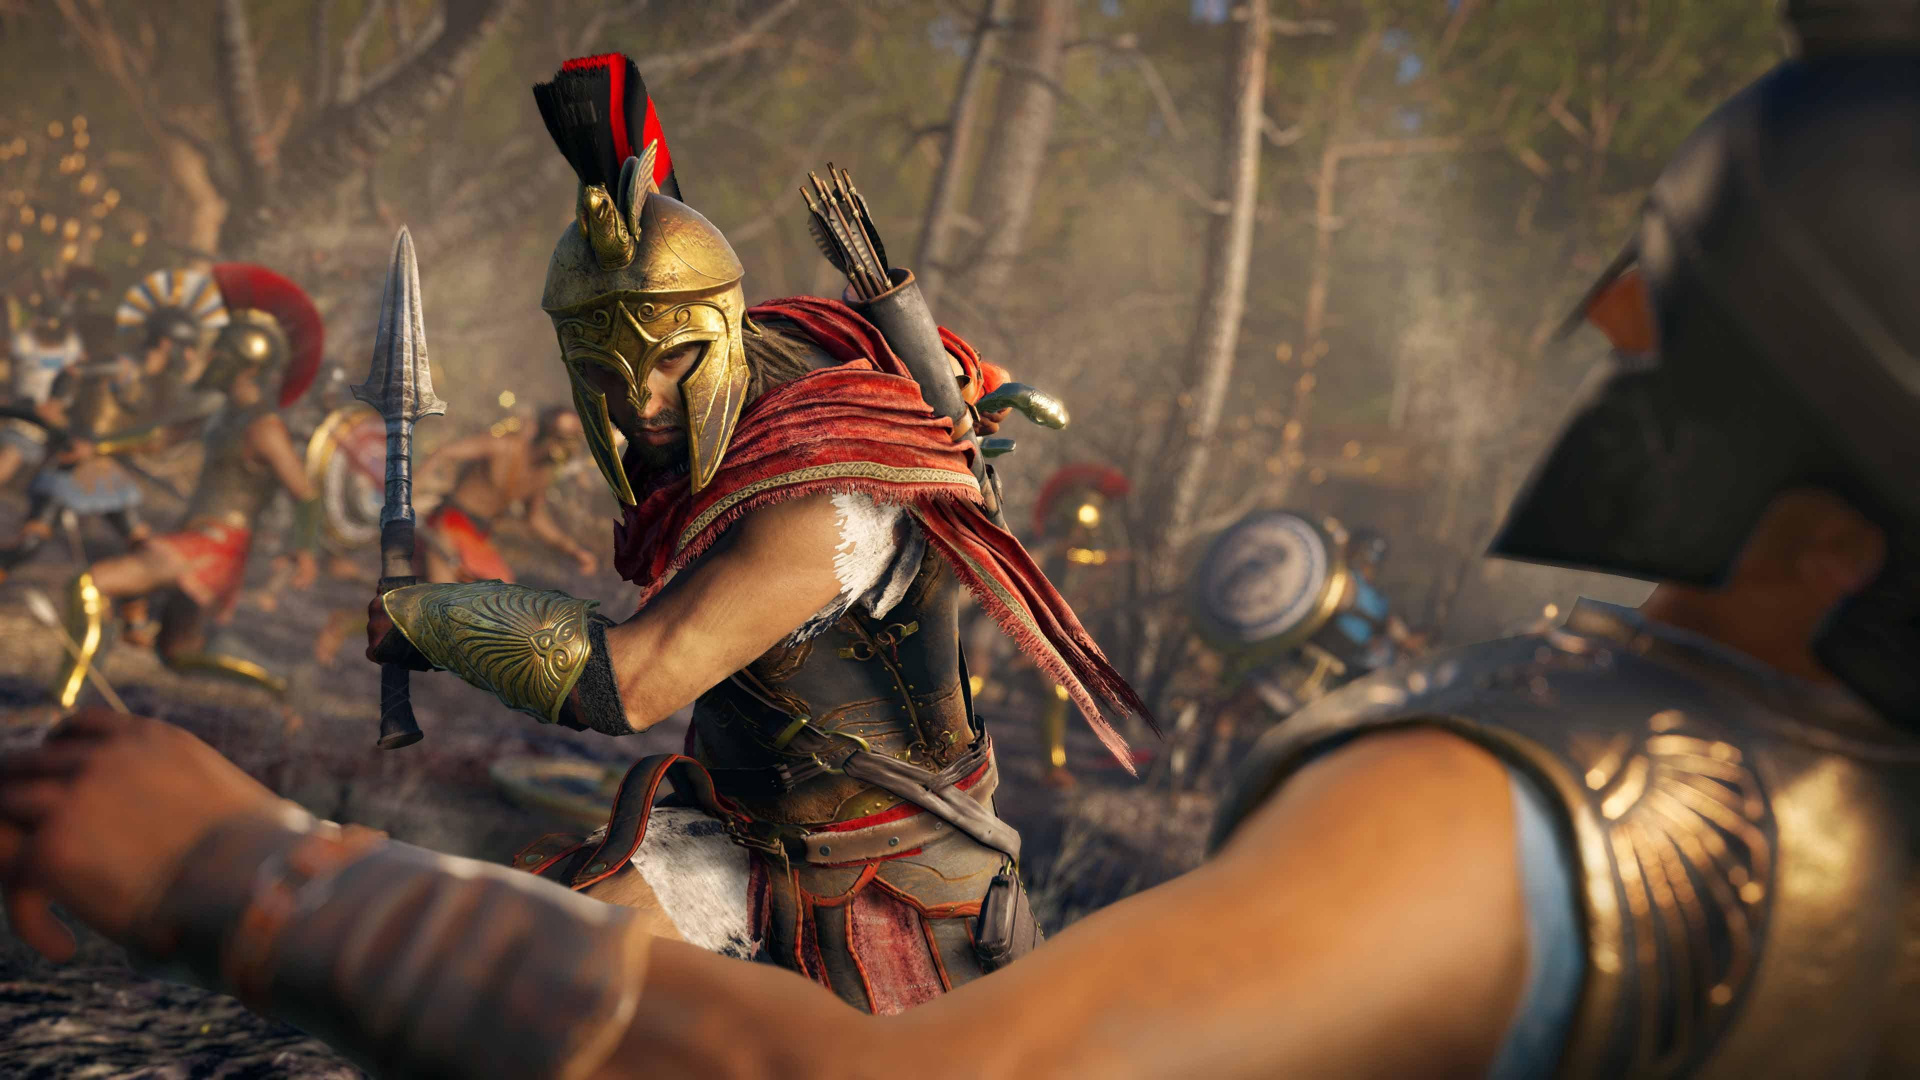 Летняя распродажа в Ubisoft Store: The Division2, Assassin's Creed, Rainbow Six Siege и другие